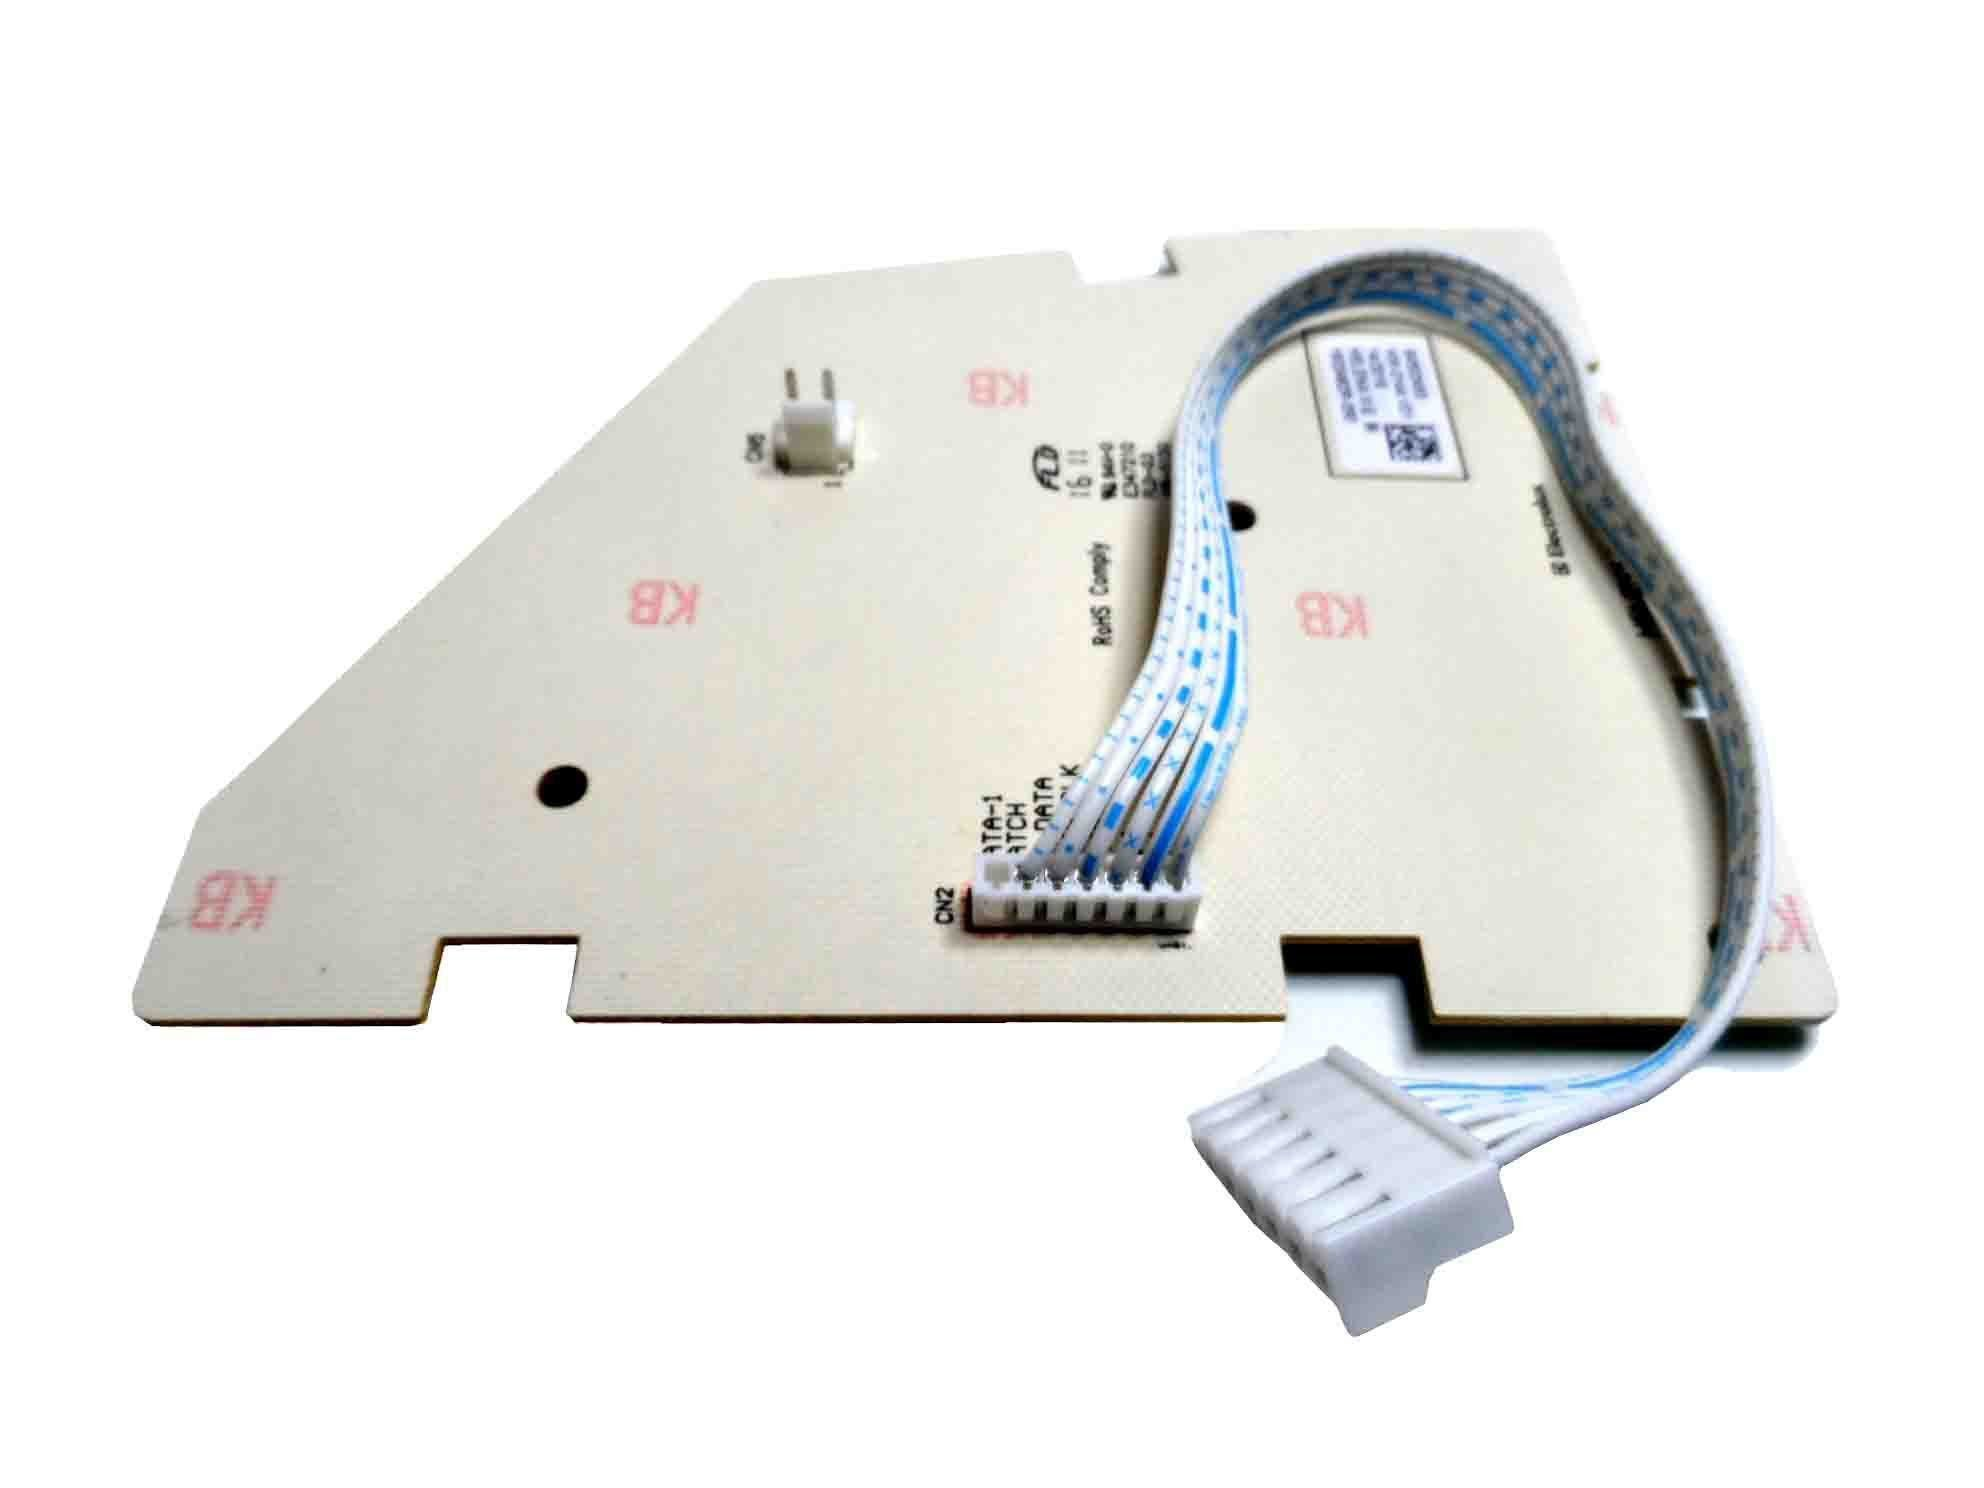 Placa Eletrônica Interface Lavadora Electrolux  64502493